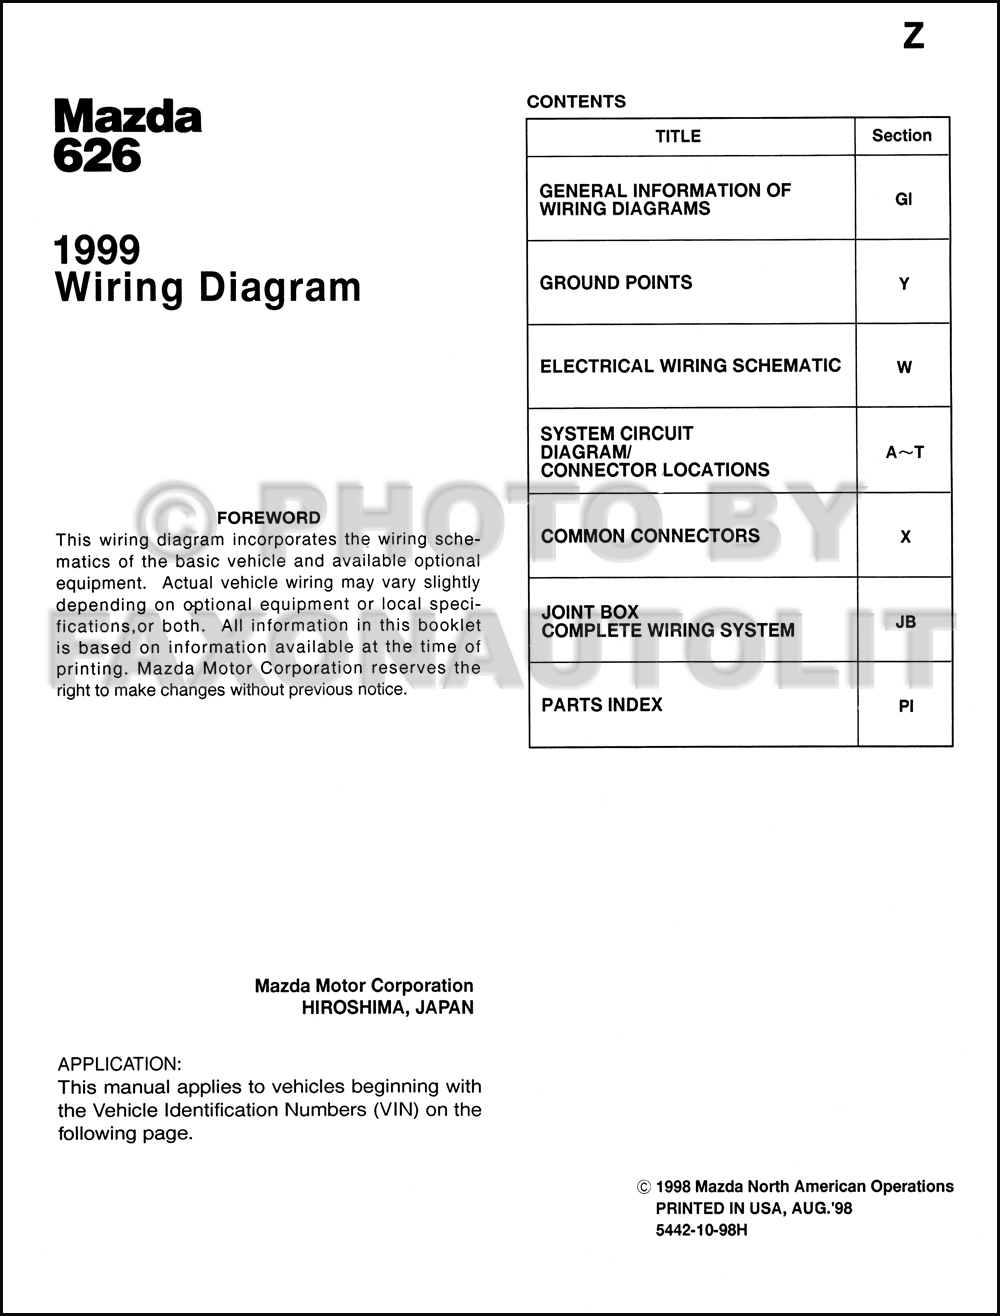 1997 Mazda B4000 Fuse Box   Wiring Diagram on 2002 mazda protege brake diagram, 1999 mazda protege diagram, 2000 protege fuse diagram,